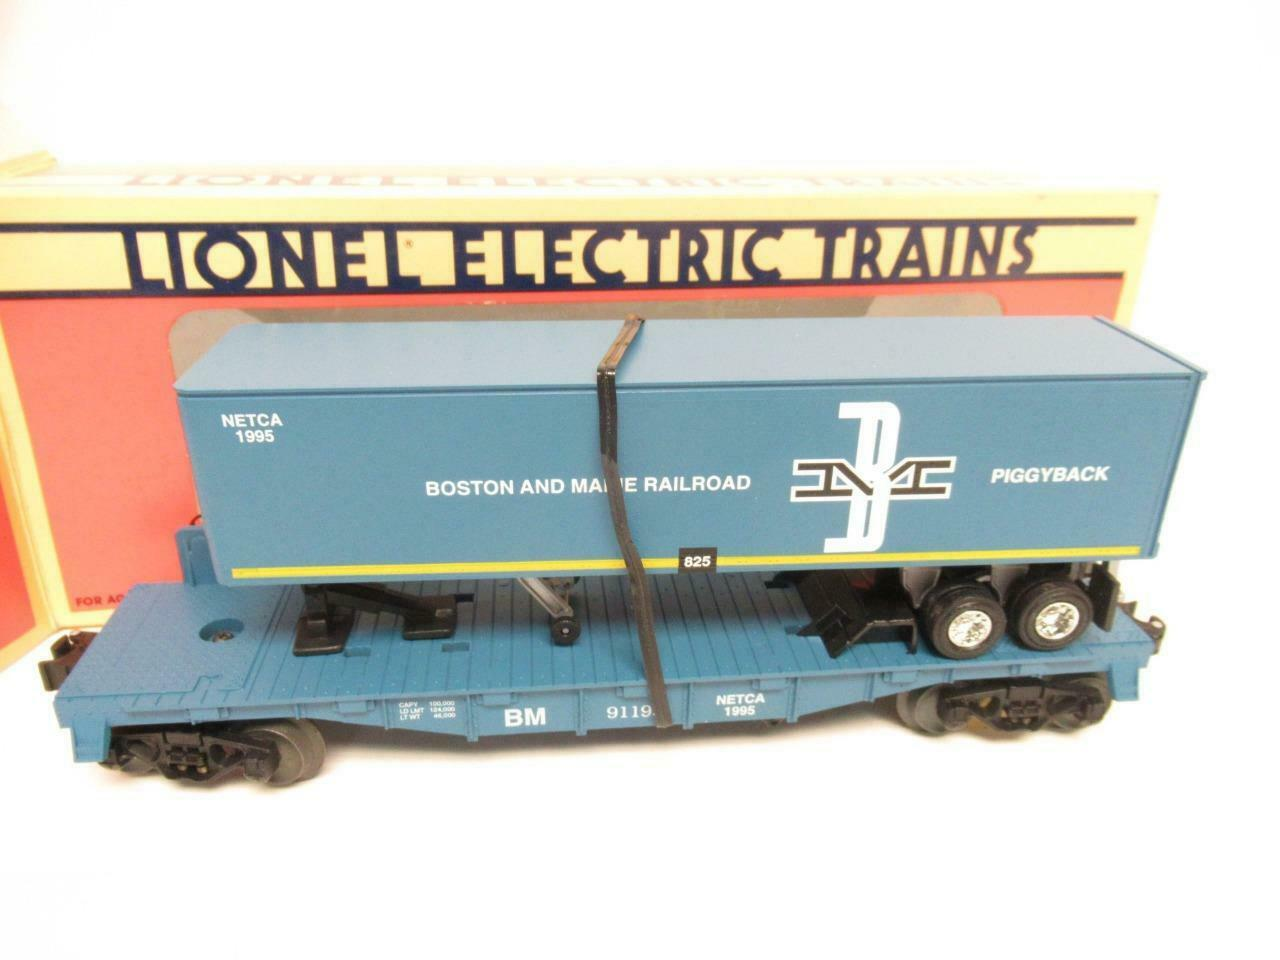 LIONEL LTD. PROD.- 52080- BOSTON- OCH MAINE FLAT W TjärnvägER - 1995 NETCA - M33